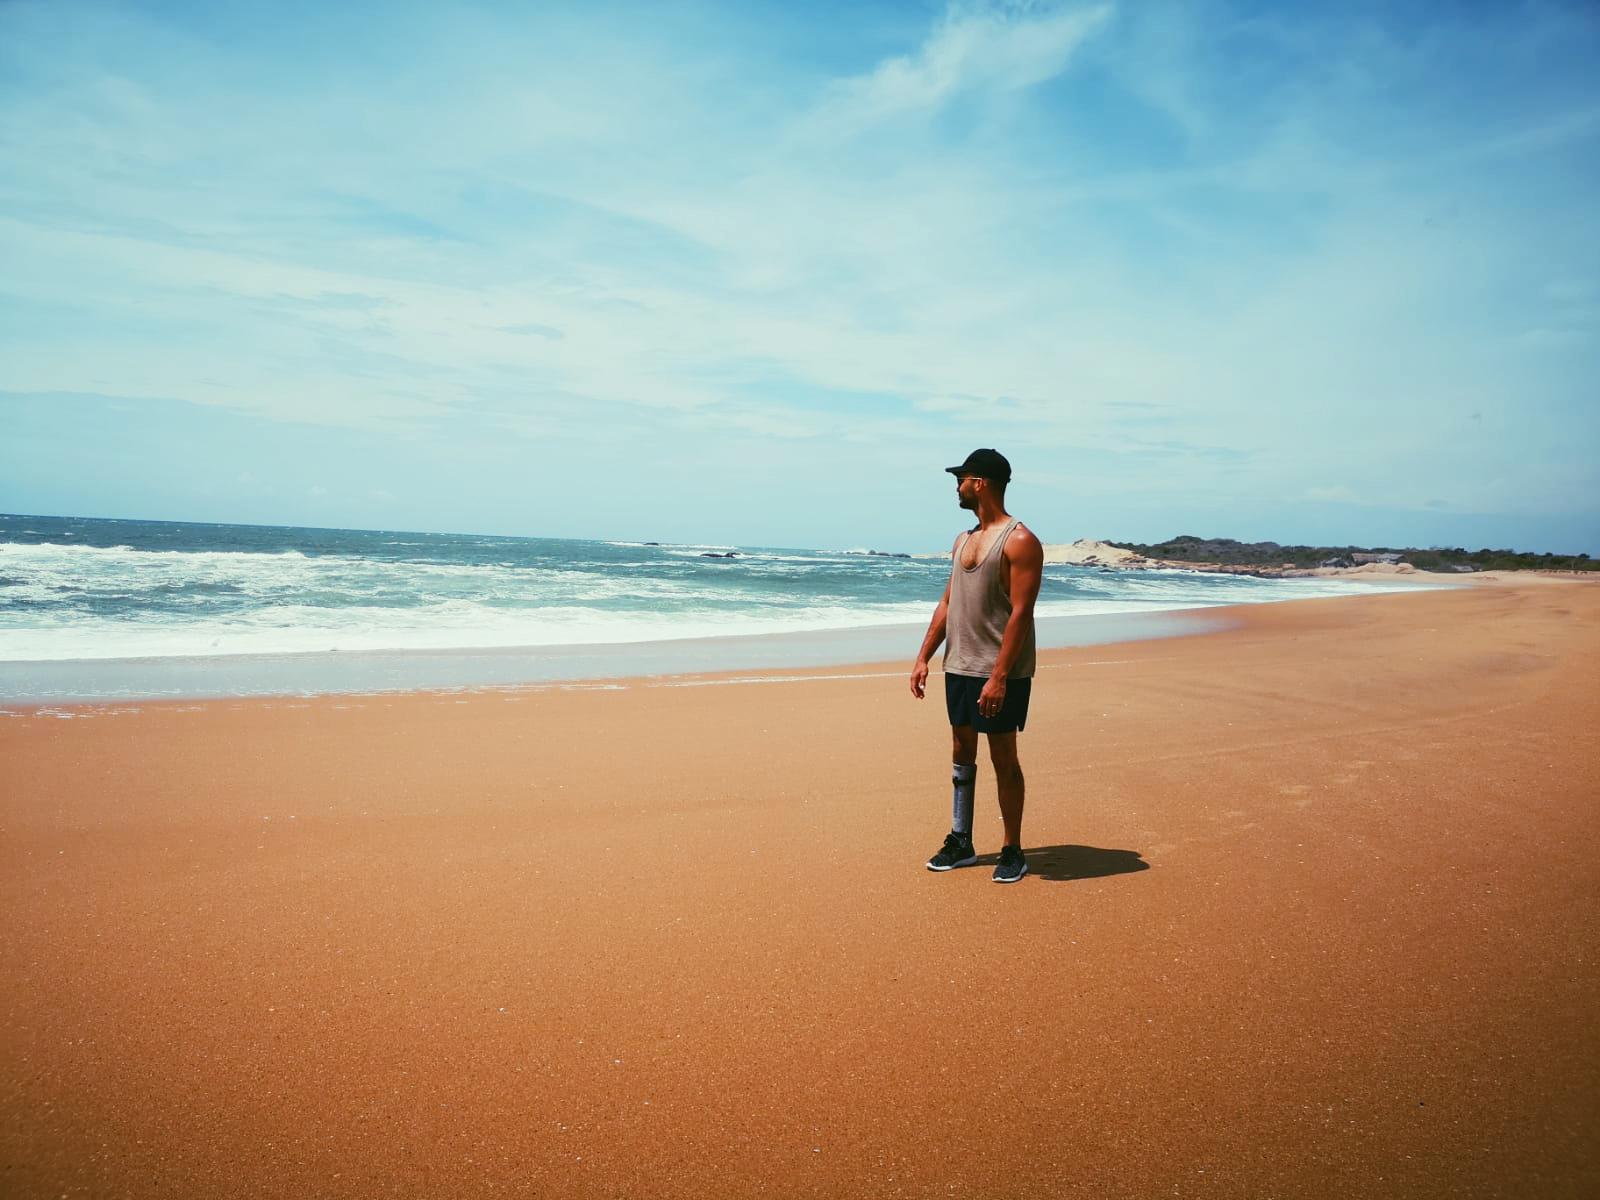 invite-to-paradise-sri-lanka-holiday-honeymoon-specialists-customer-feedback-elin-jordan-luce-yala-beach-1.JPG